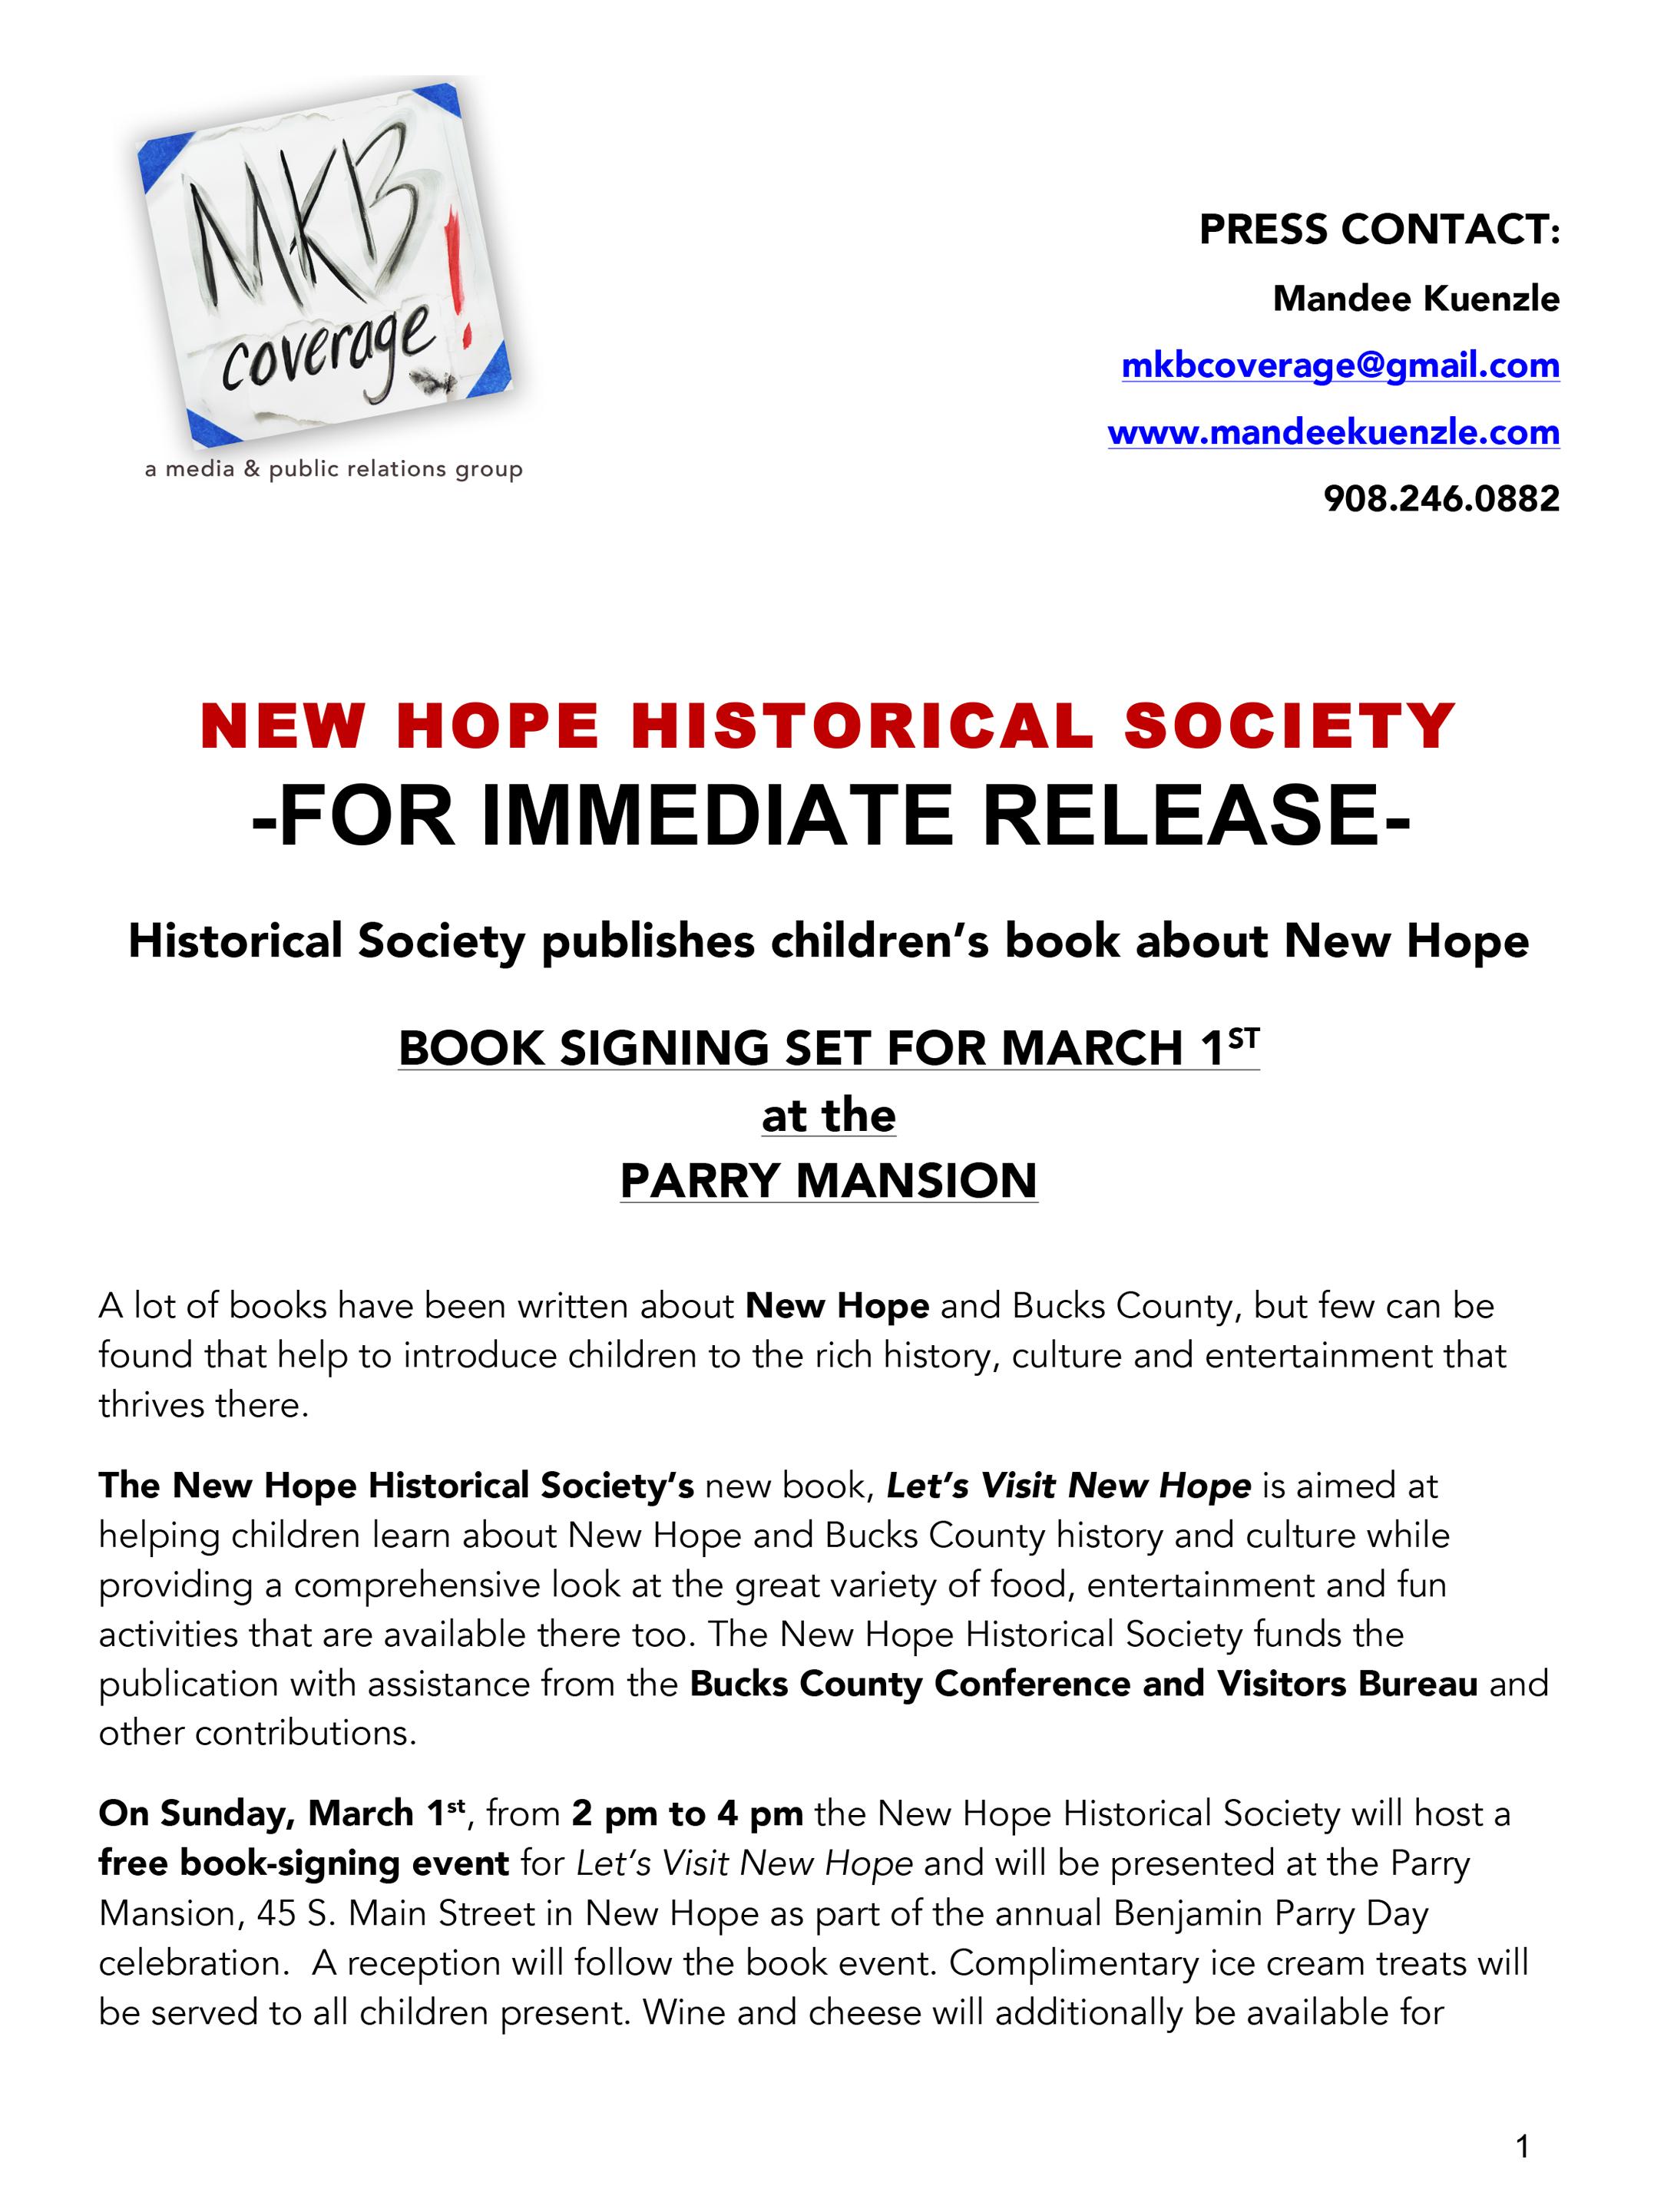 Release_HistoricalSociety_BookSigningEvent_FINAL-1.jpg